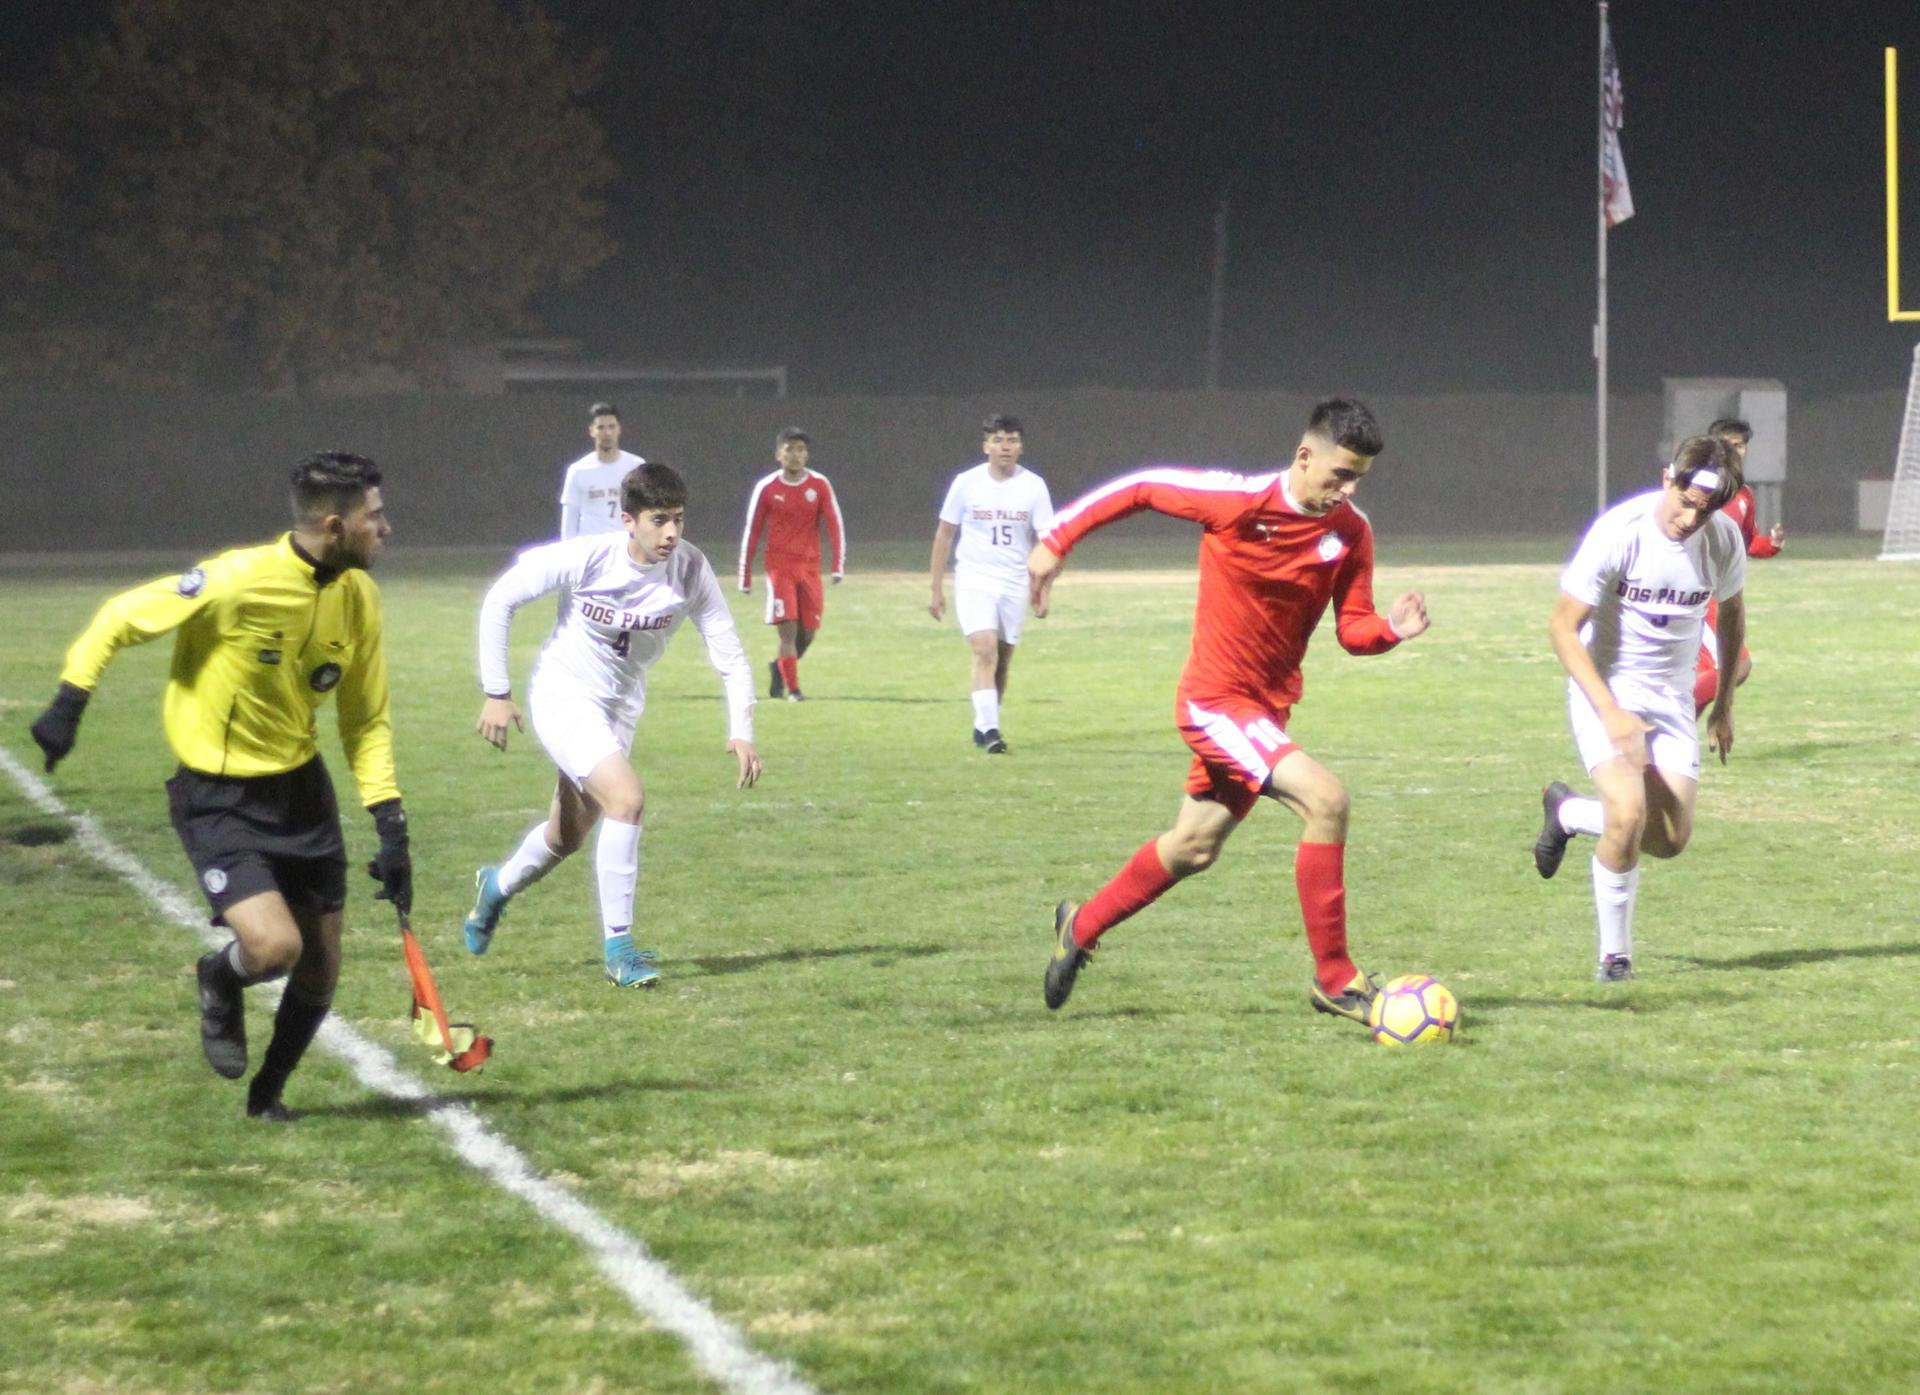 Christian Fernandez running with the ball